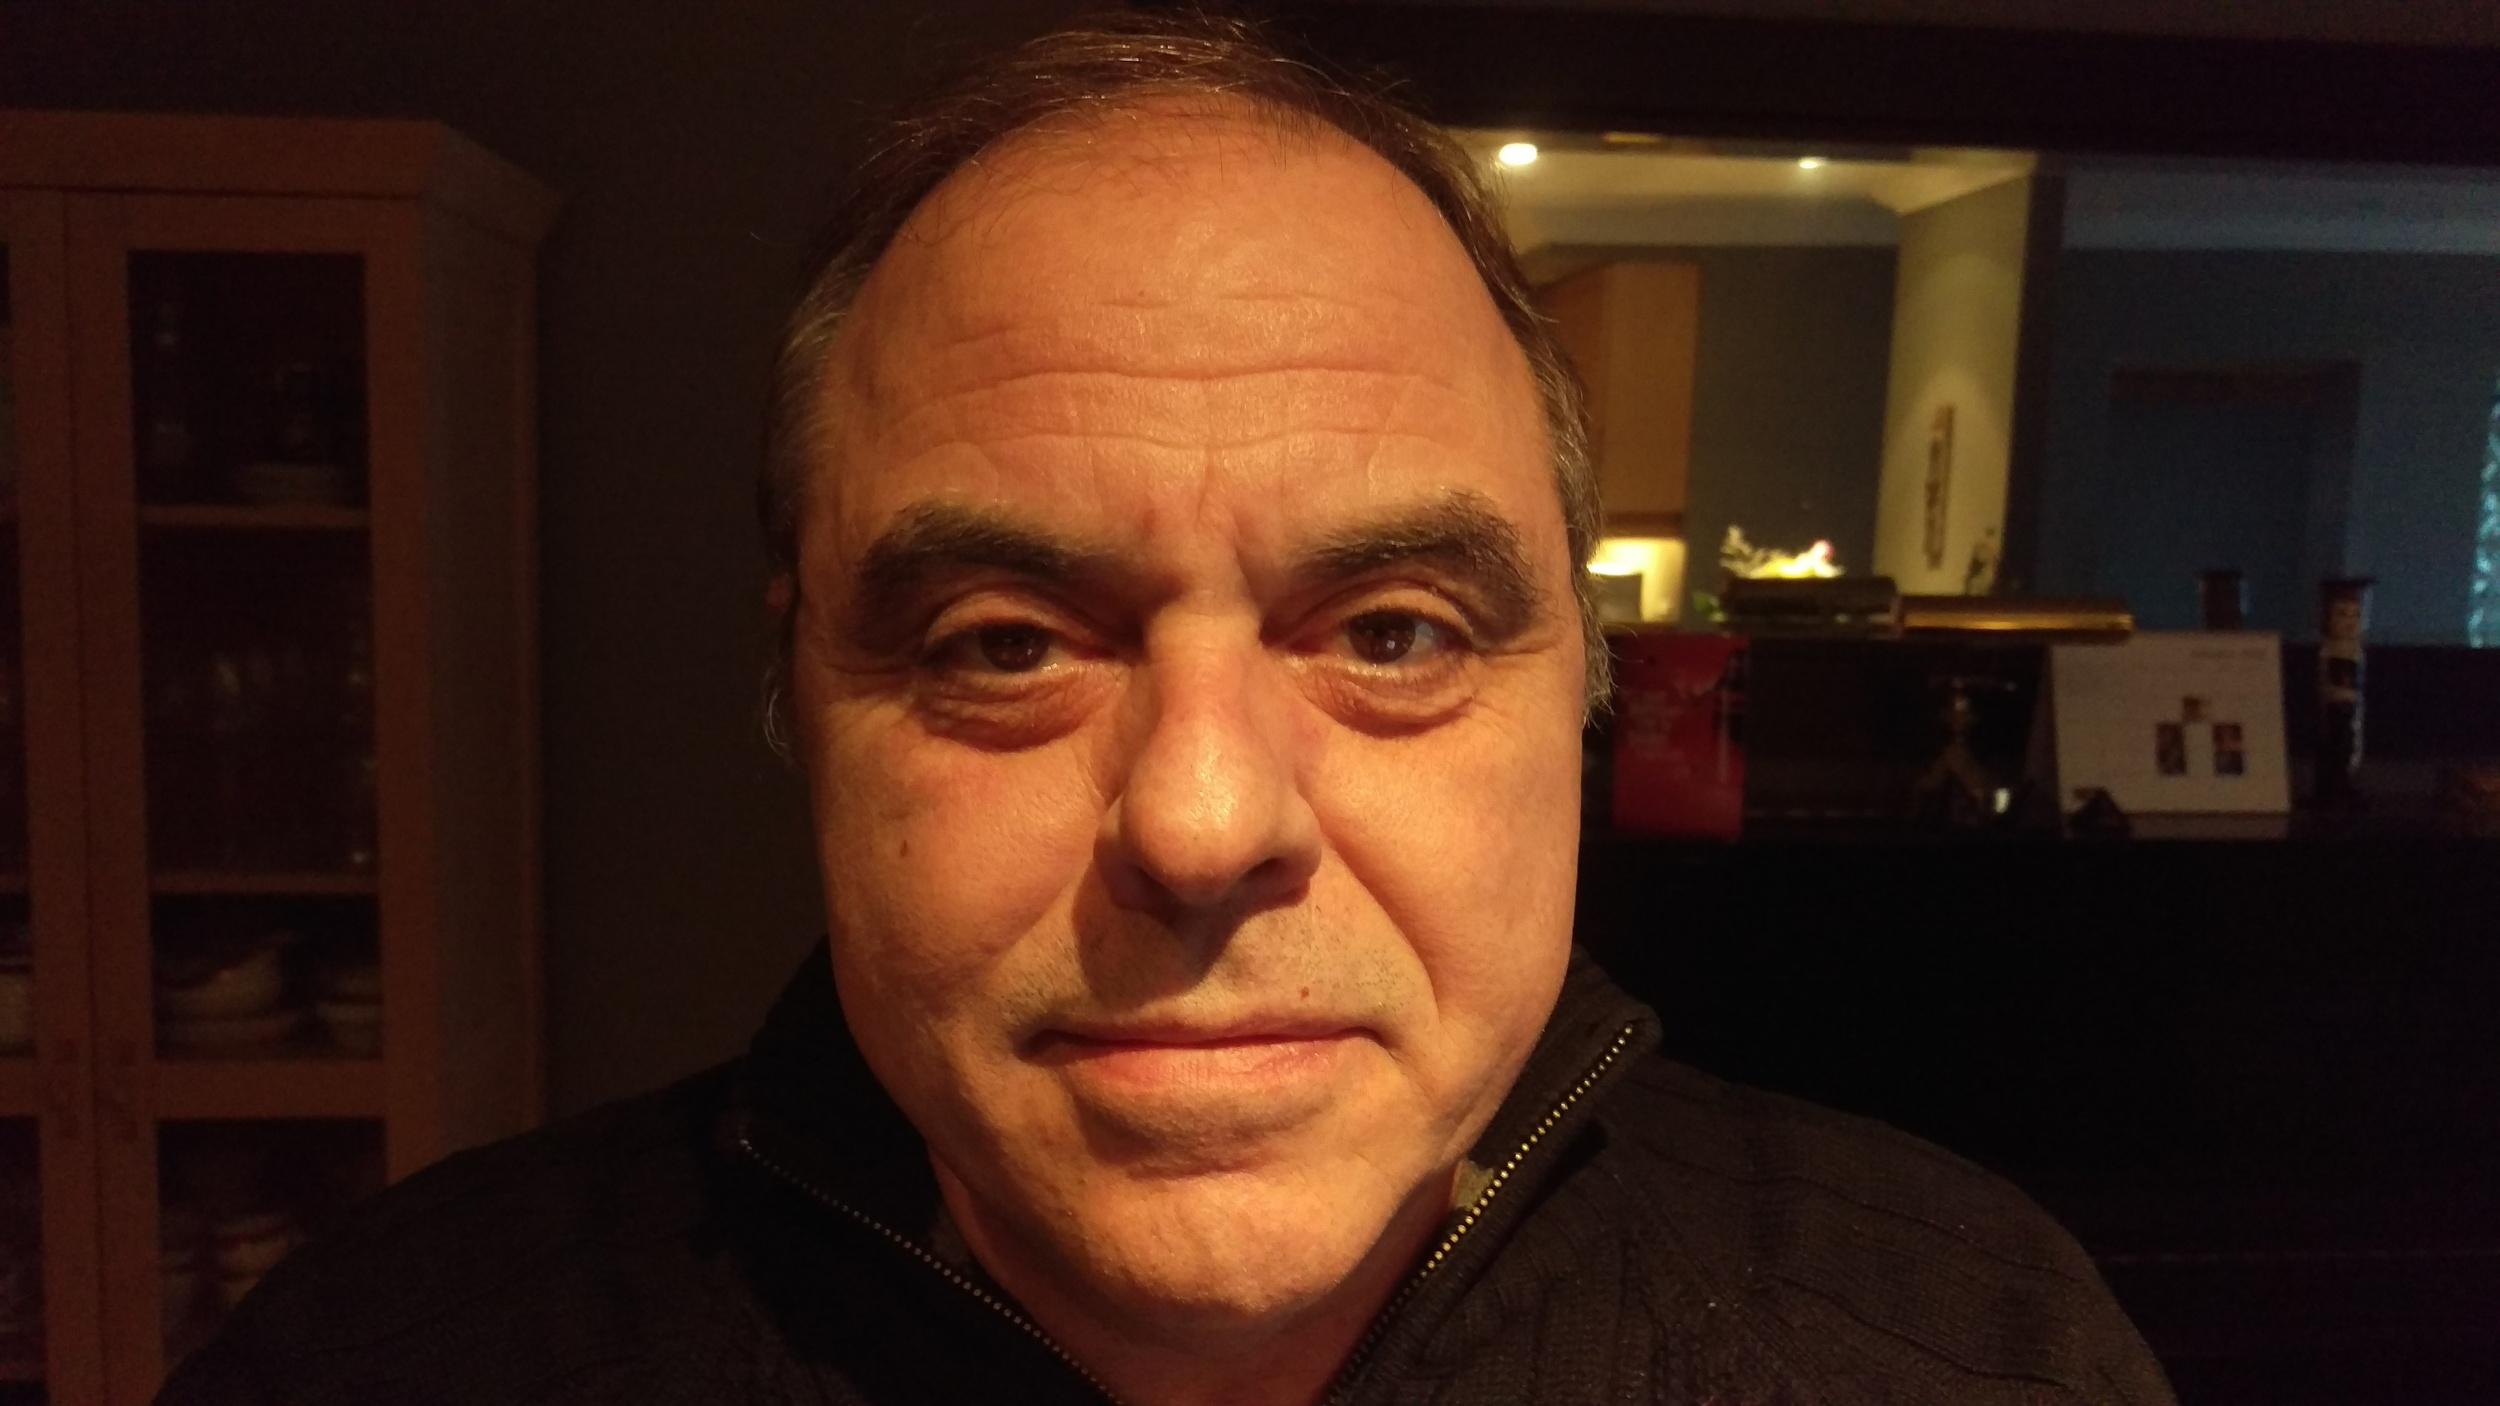 Owner and Principal Architect Bruno Melillo